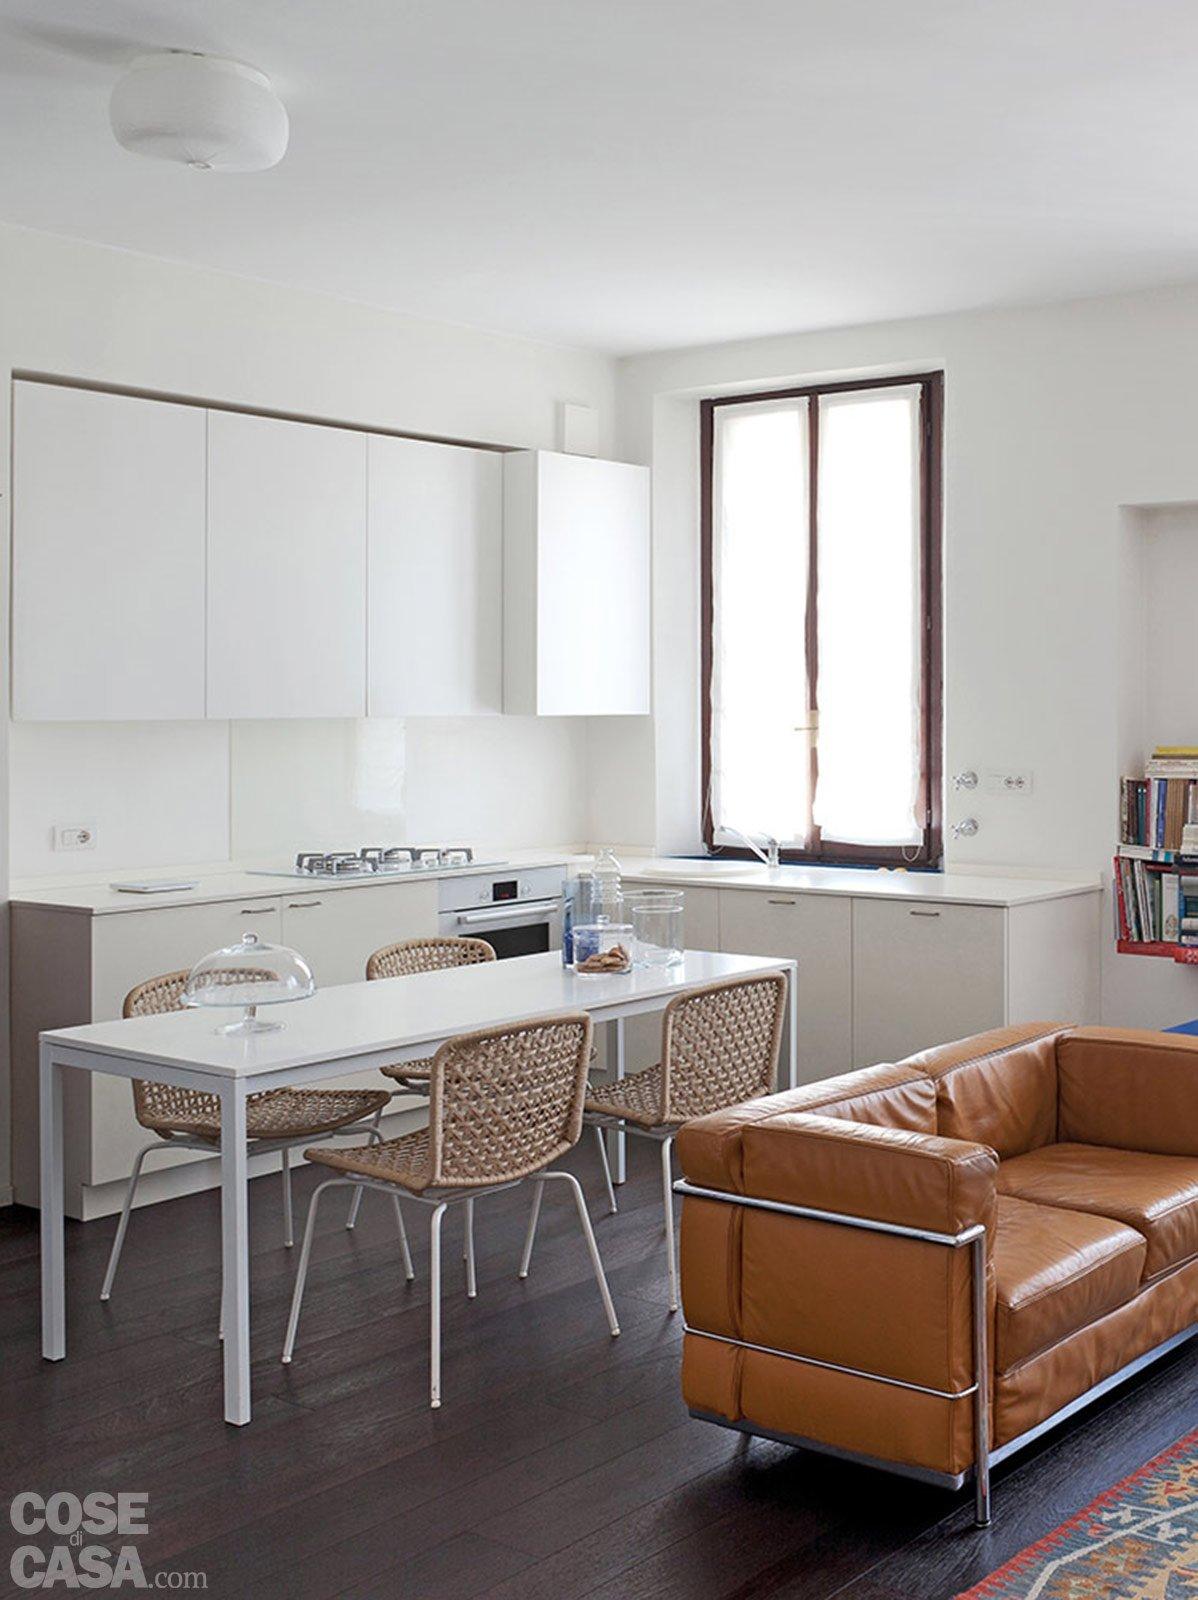 70 mq la casa migliora cos cose di casa - Sala cucina 25 mq ...